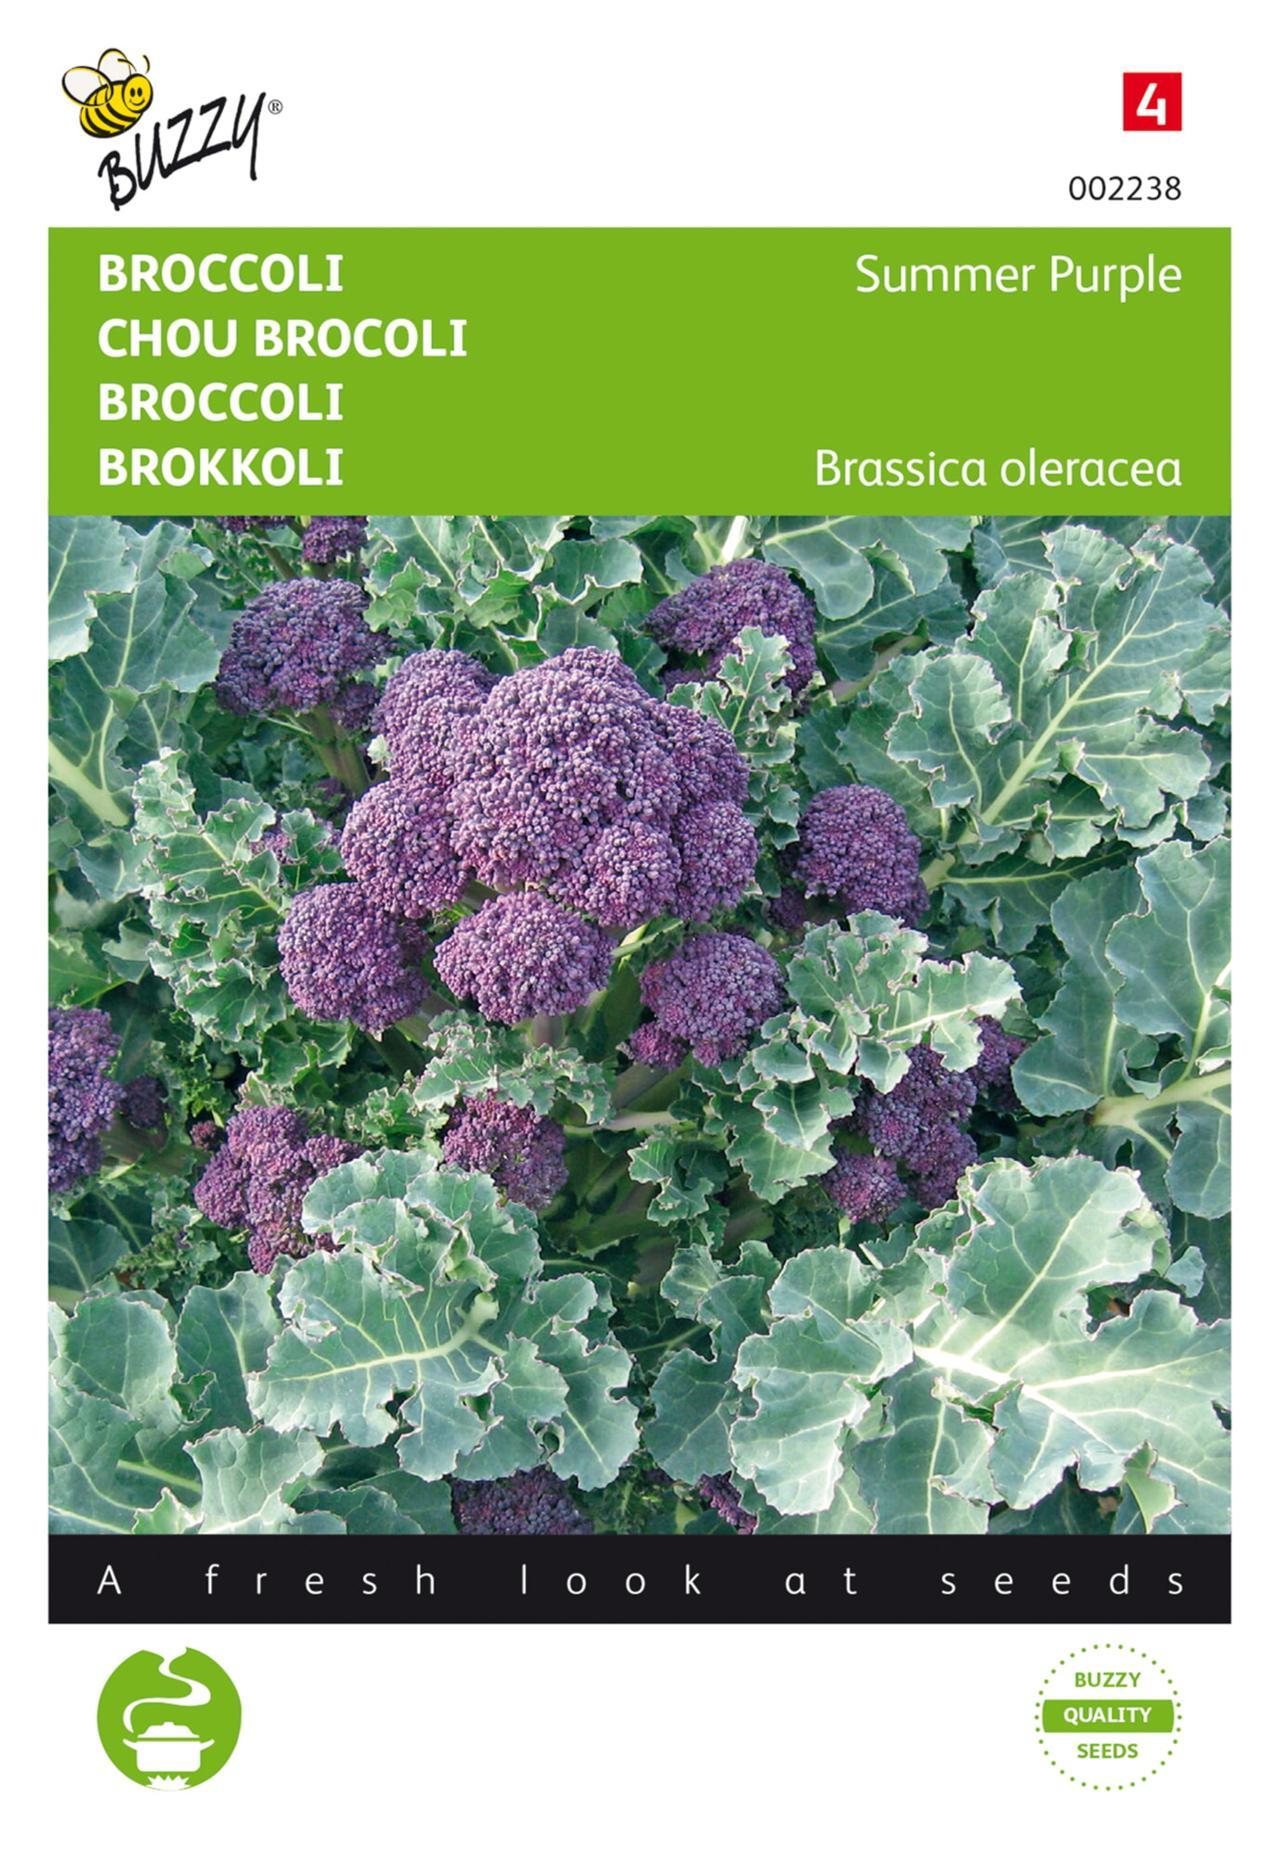 Brassica oleracea 'Summer Purple' plant